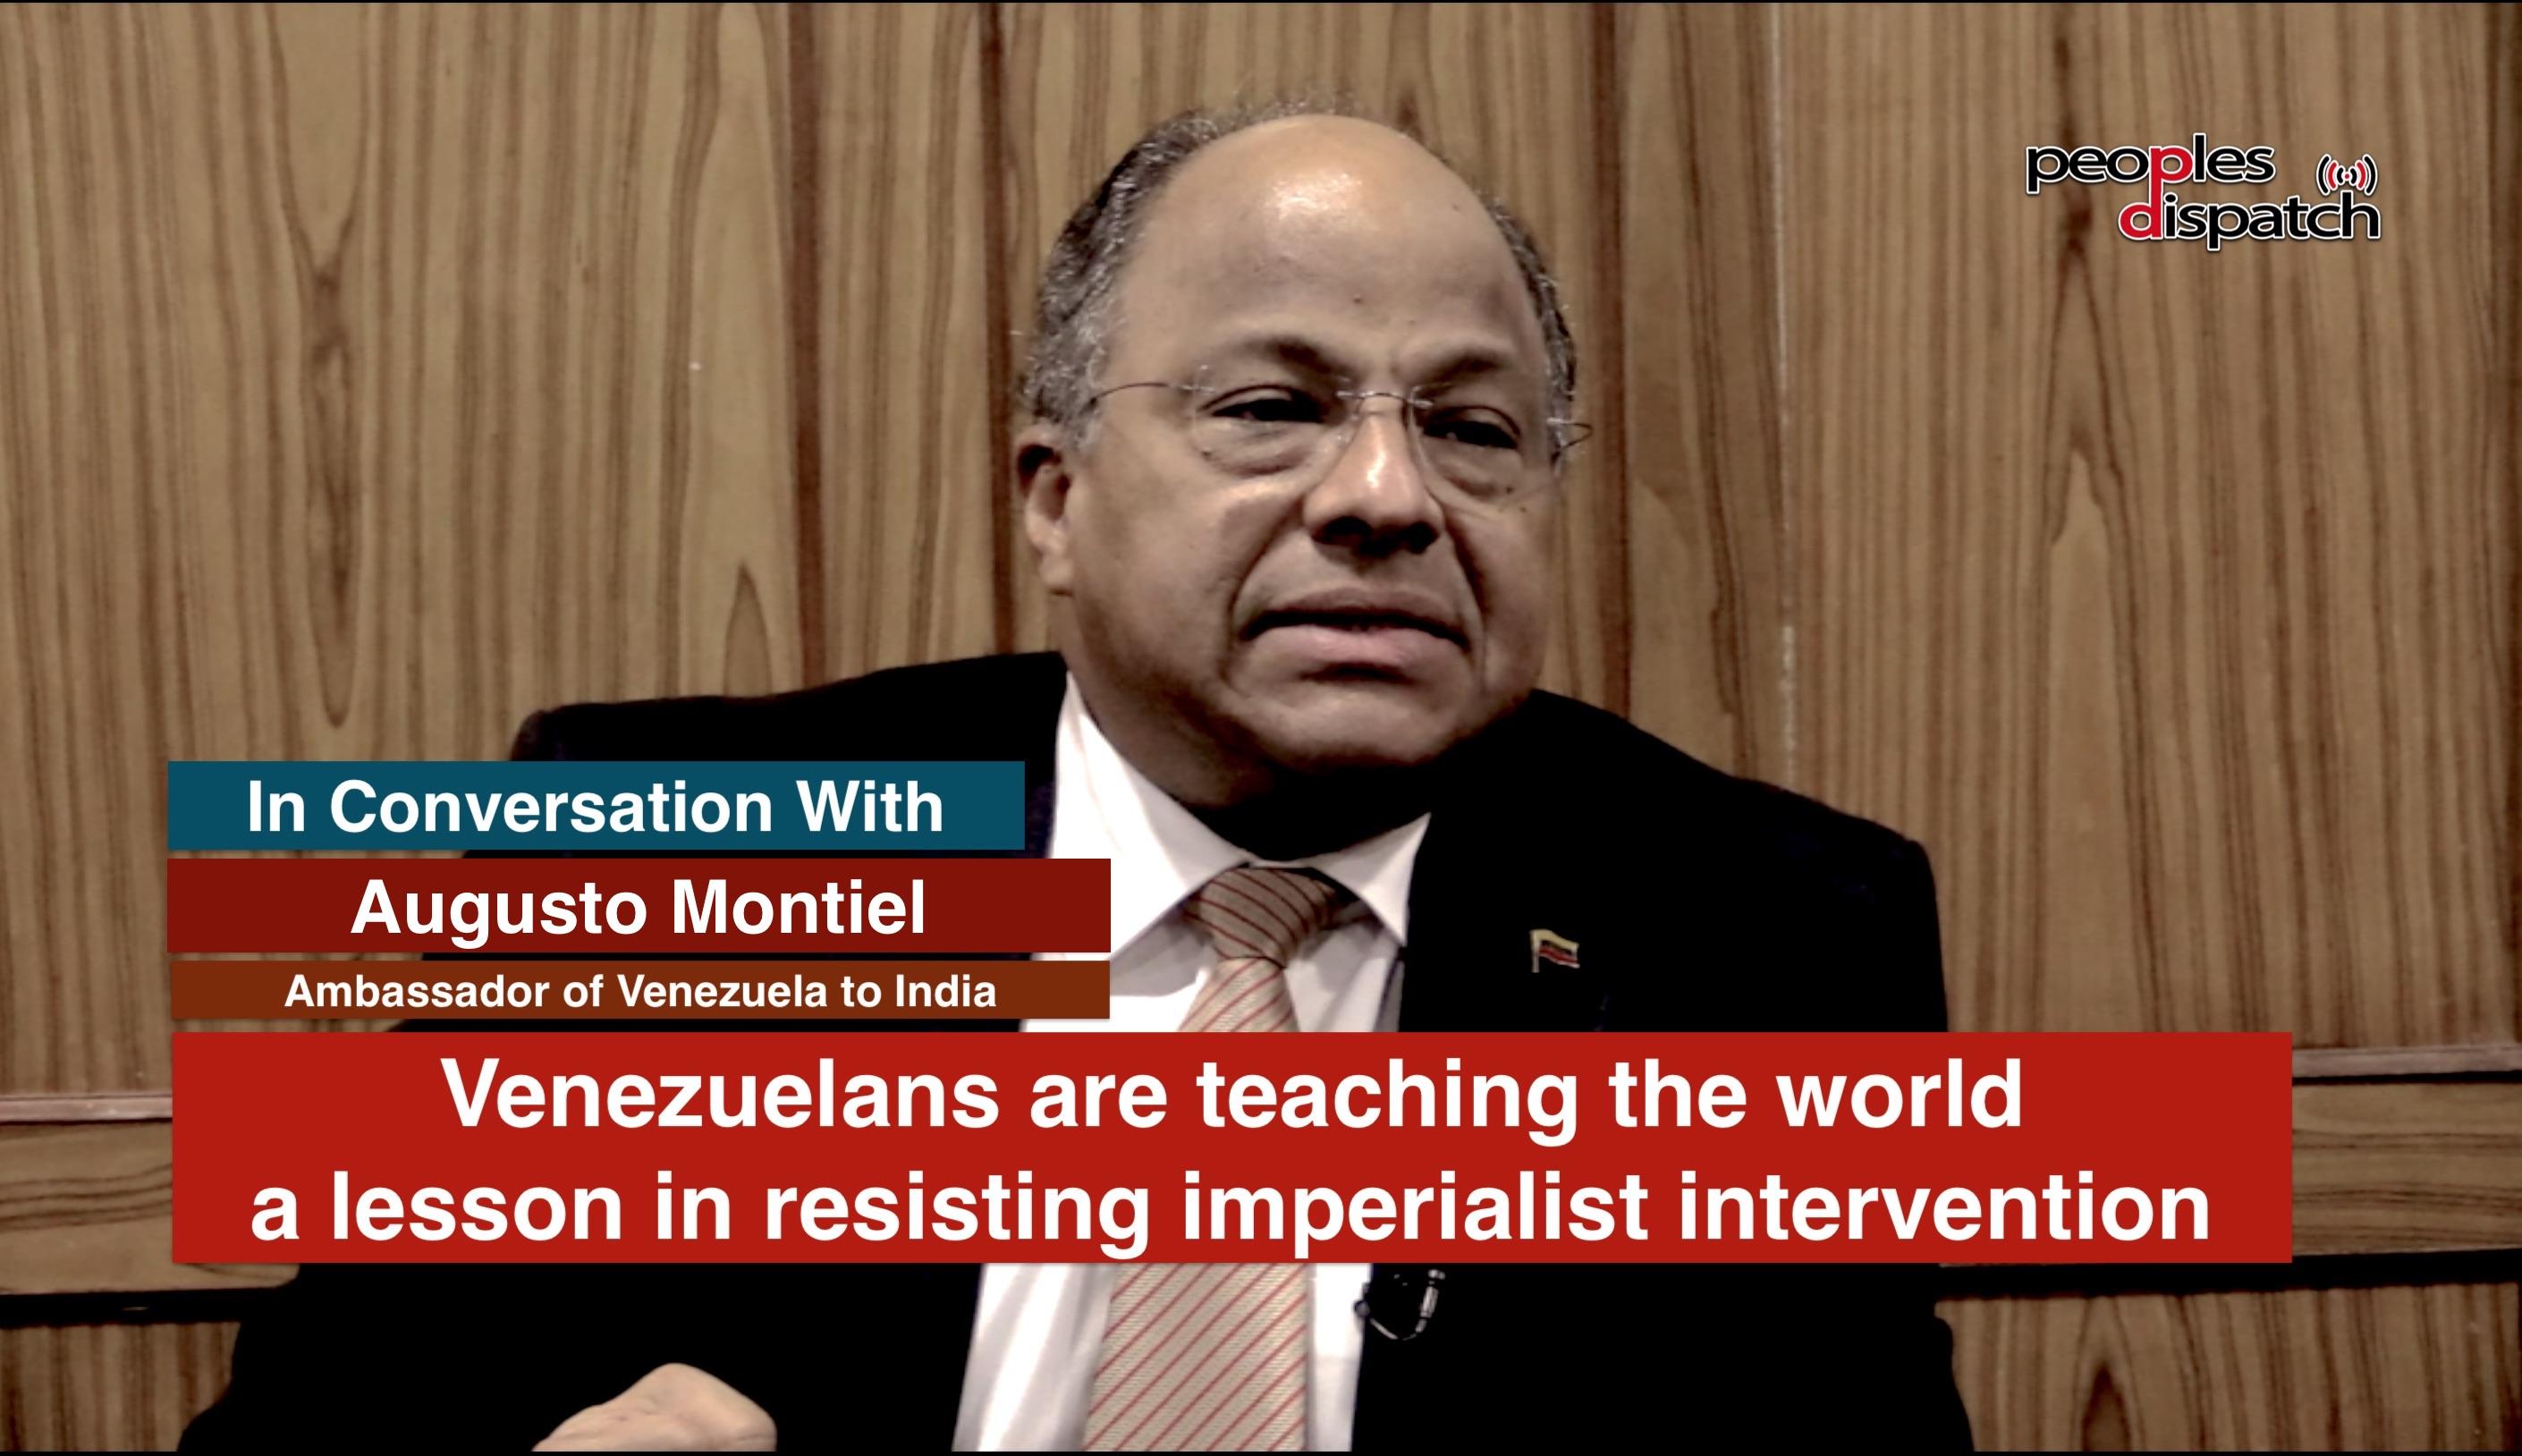 Augusto Montiel Venezuela Ambassador